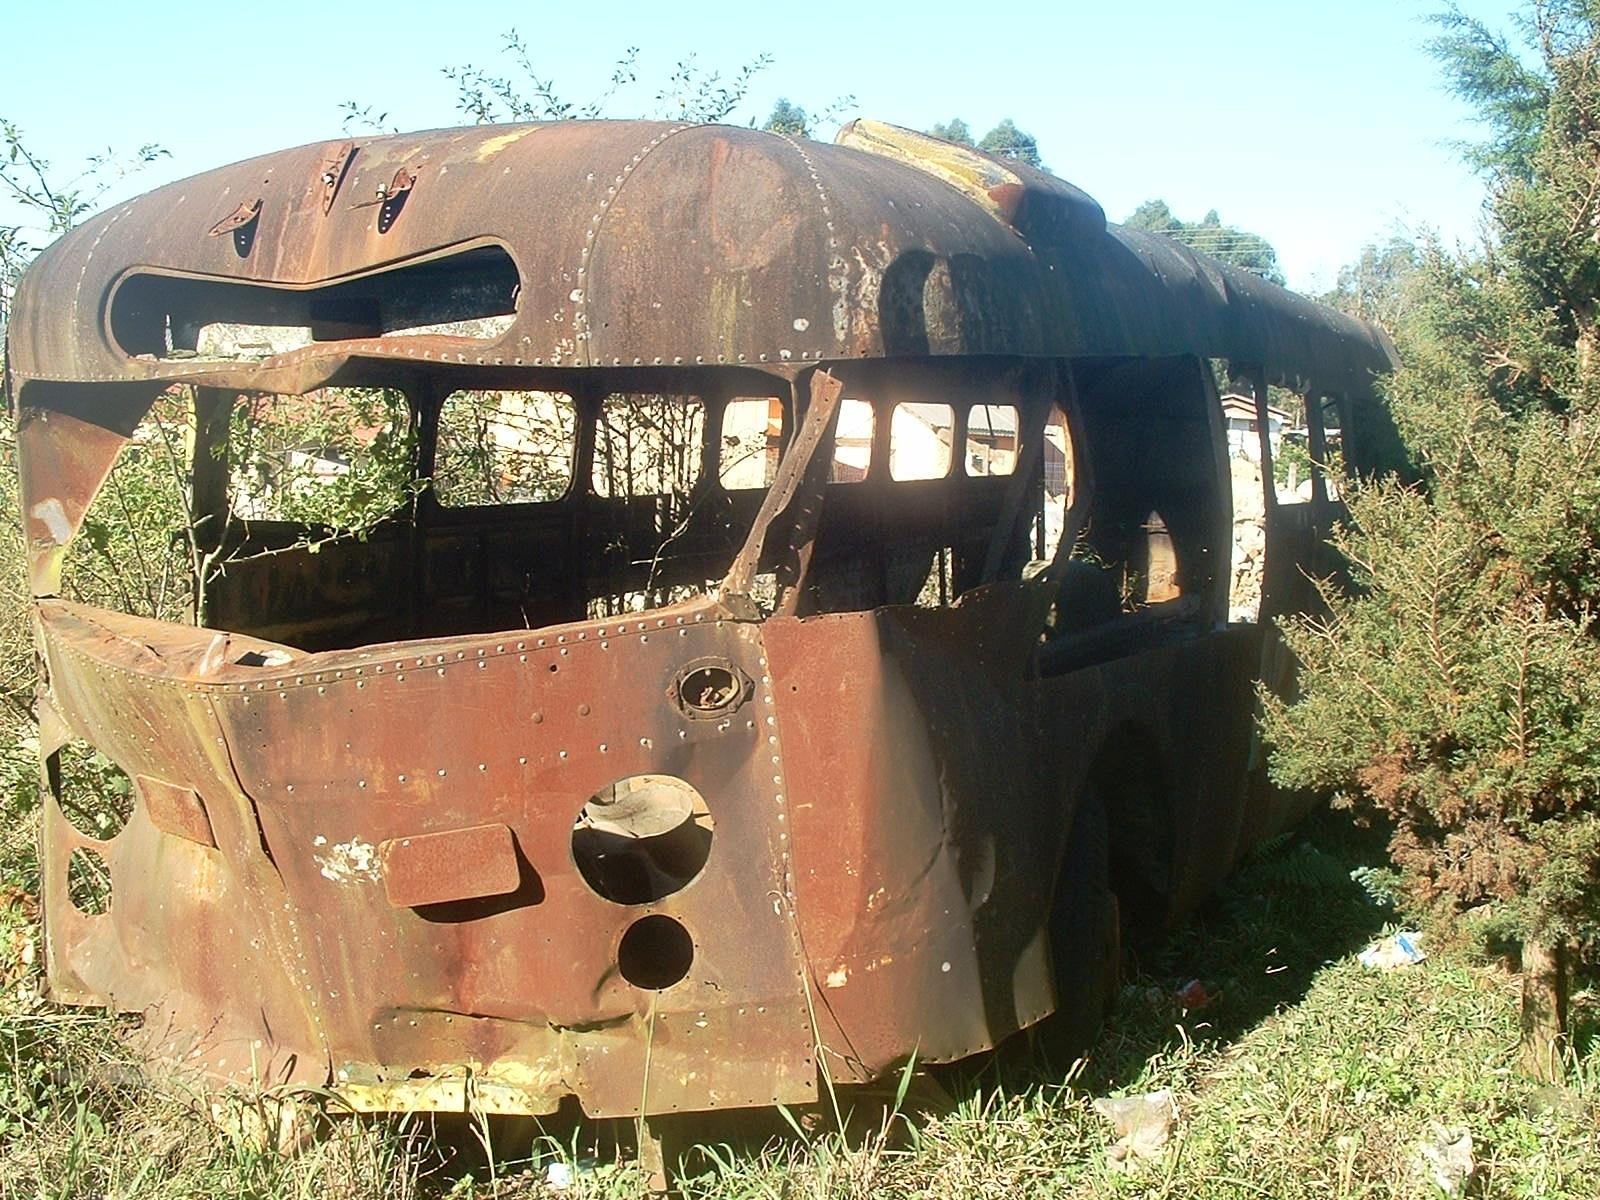 genaro_onibus_canela-rs-91 Ônibus (?!) em Canela-RS